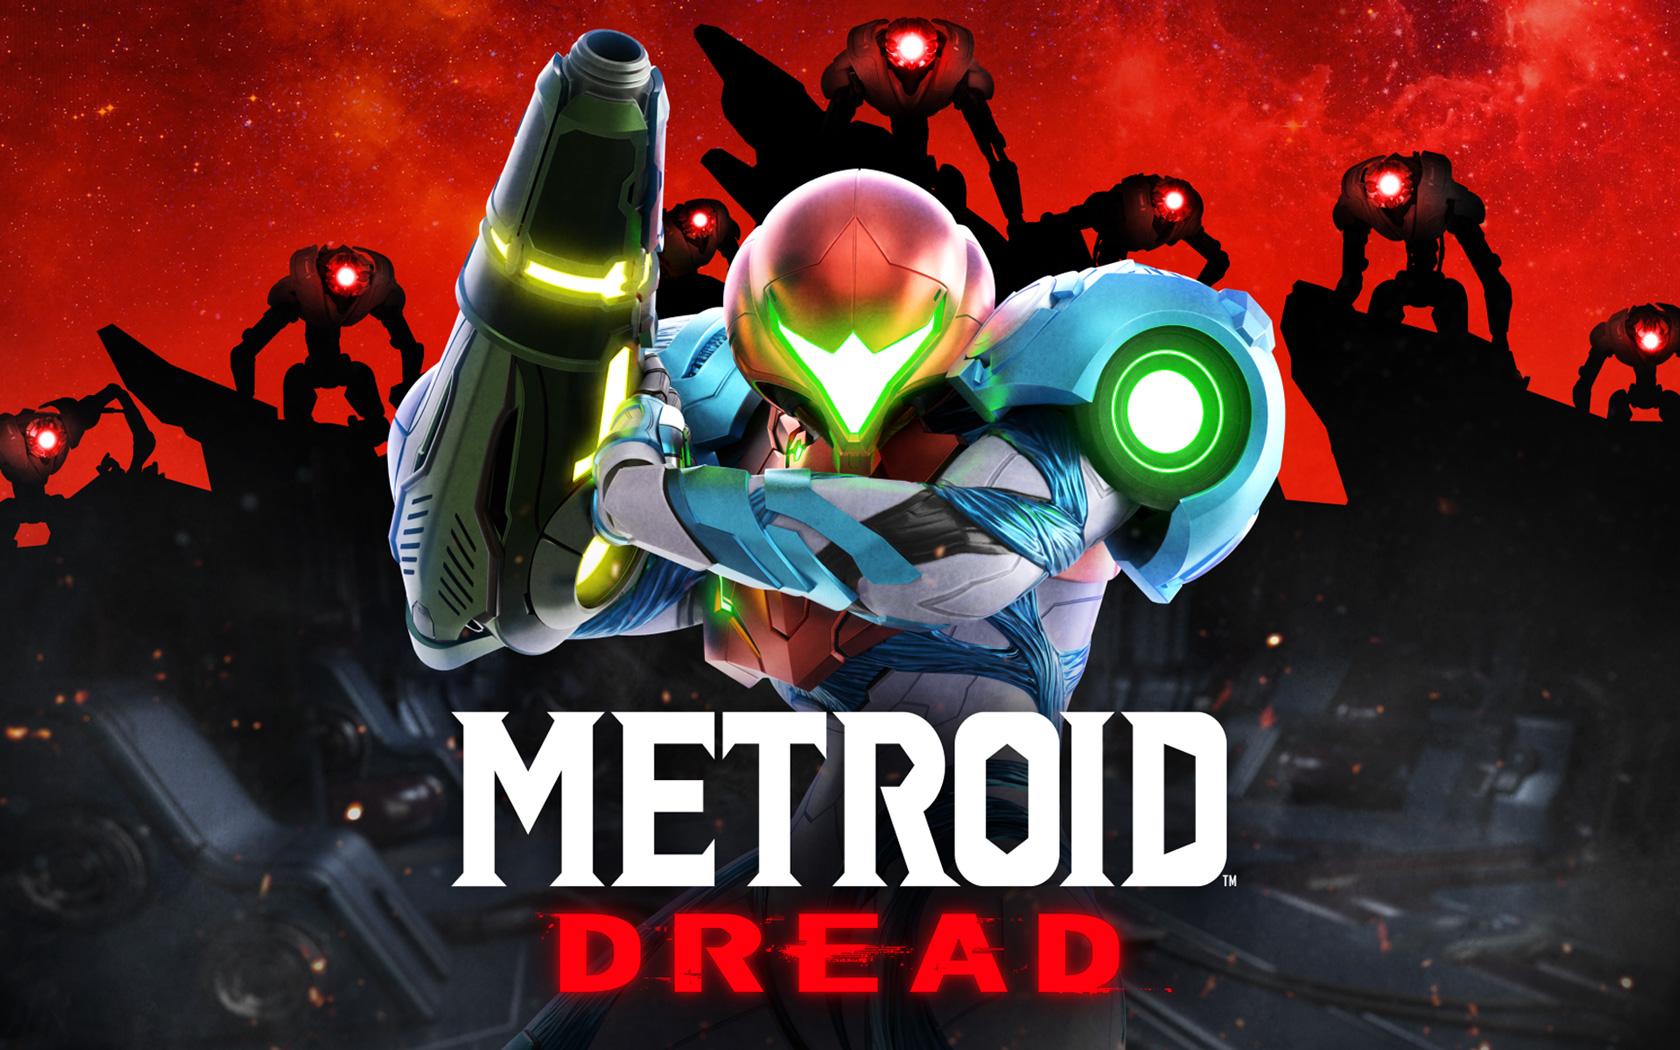 Free Metroid Dread Wallpaper in 1680x1050